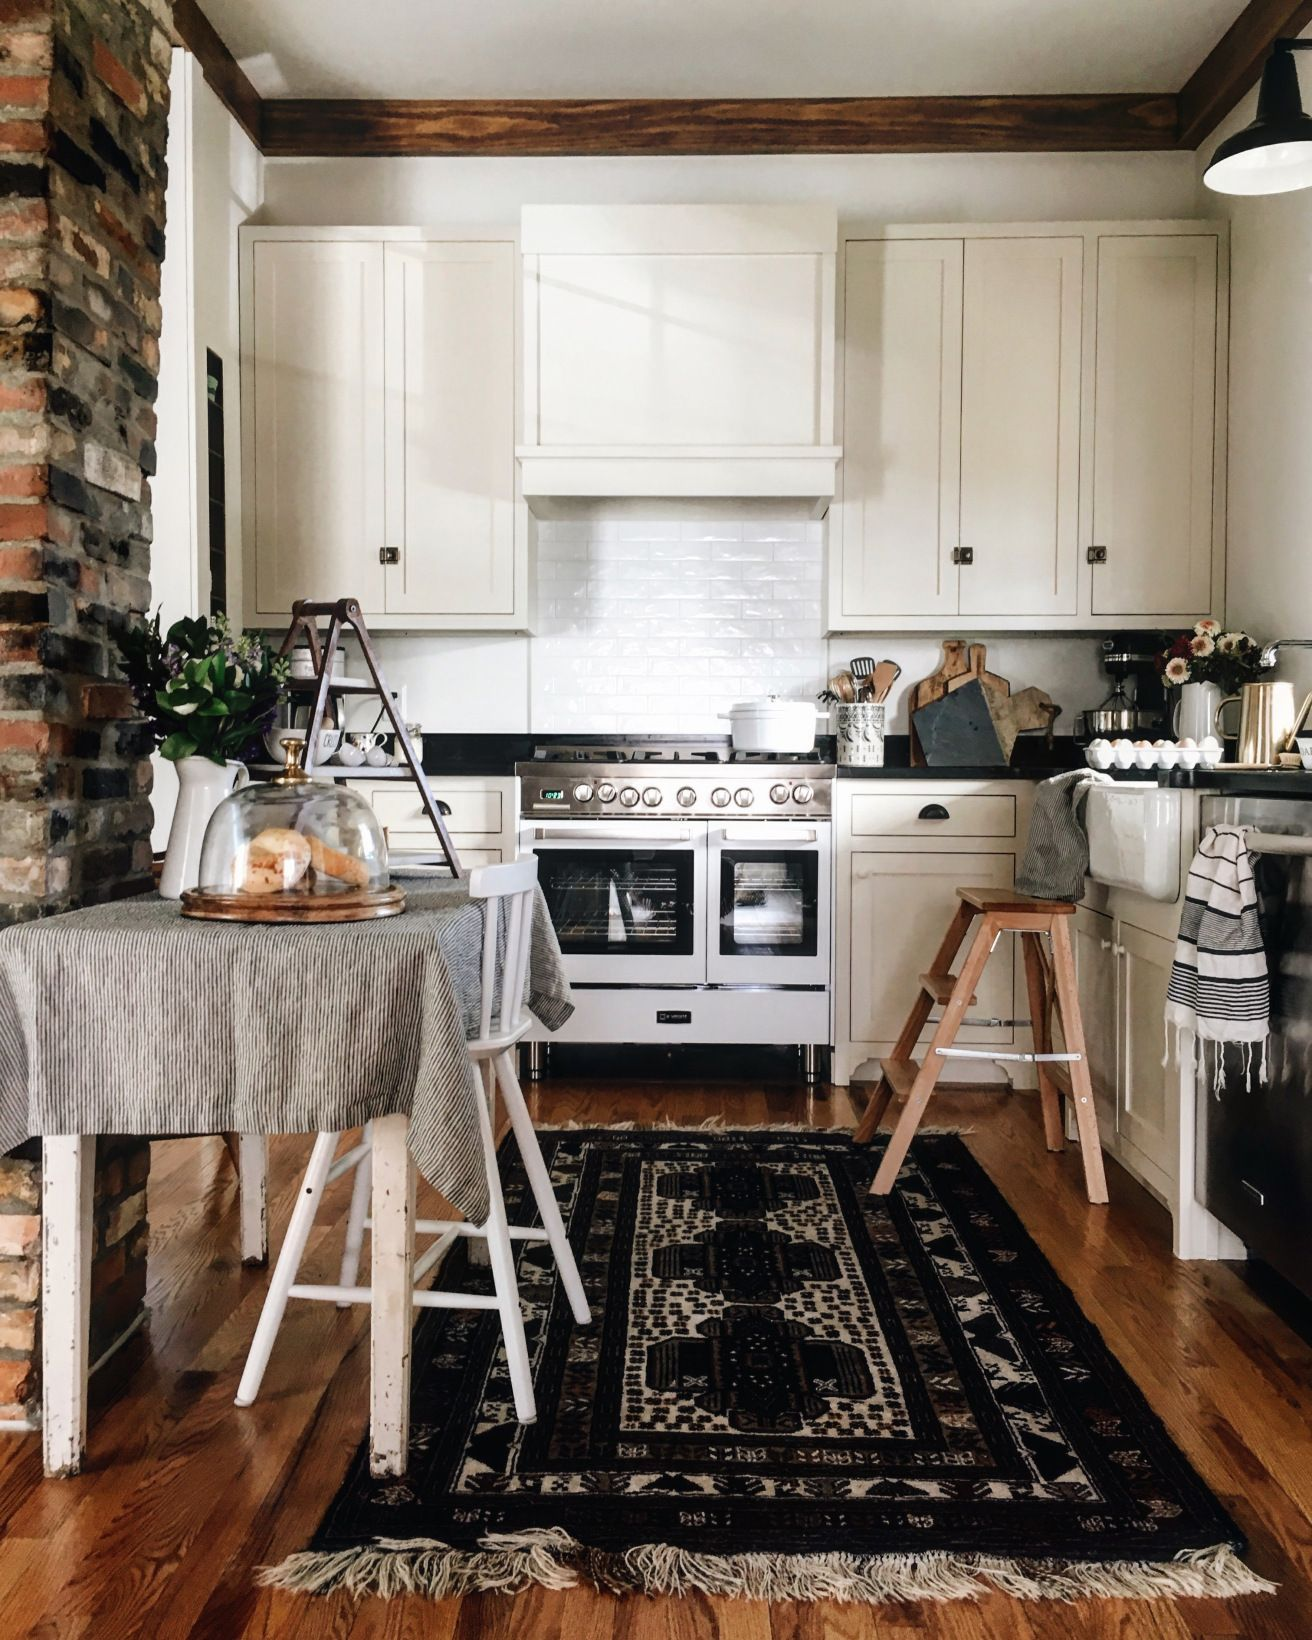 the kitchen home decor kitchen kitchen design decor modern farmhouse kitchens on kitchen interior farmhouse id=61464